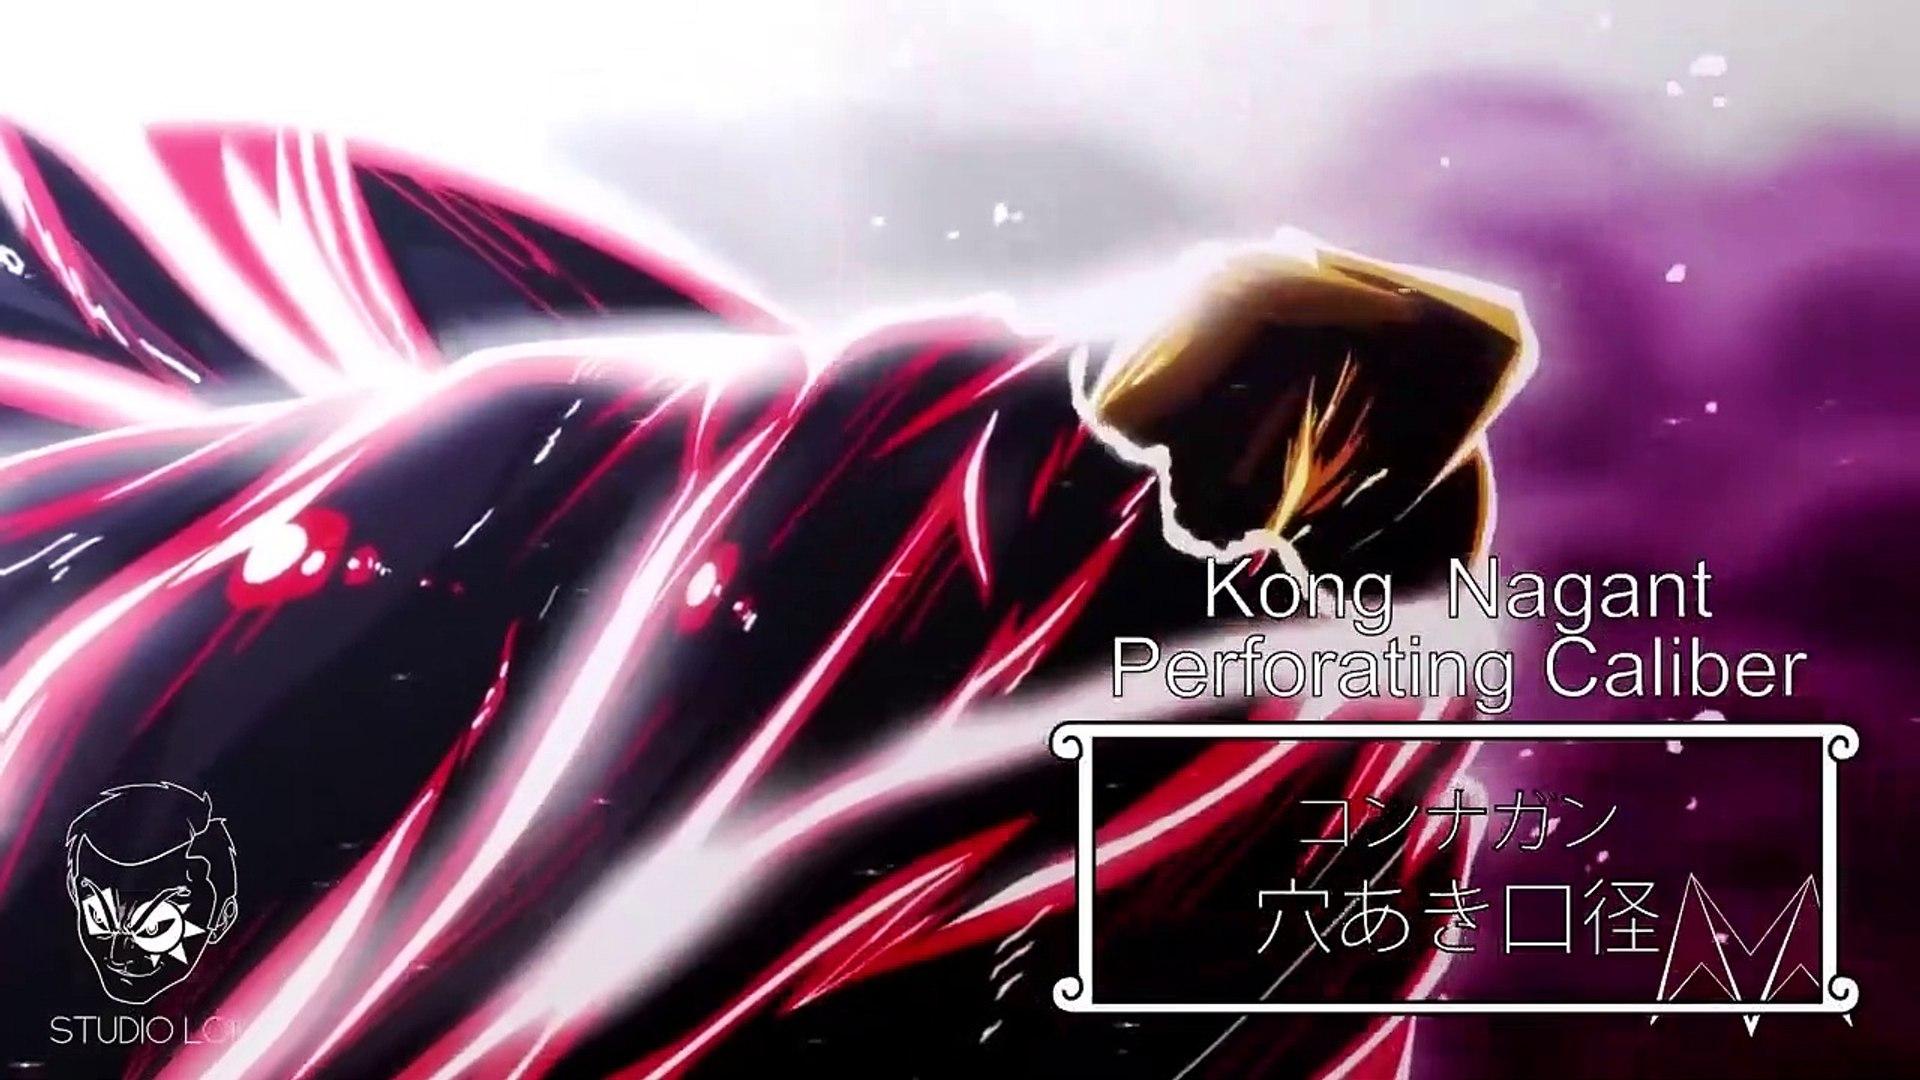 Download lagu one piece luffy vs yonko kaido sub indo full fight anime 5.6 mb, download mp3 & video one piece luffy vs yonko kaido sub indo full fight. Luffy Vs Kaido 5th Gear Full Fight Hd Video Dailymotion